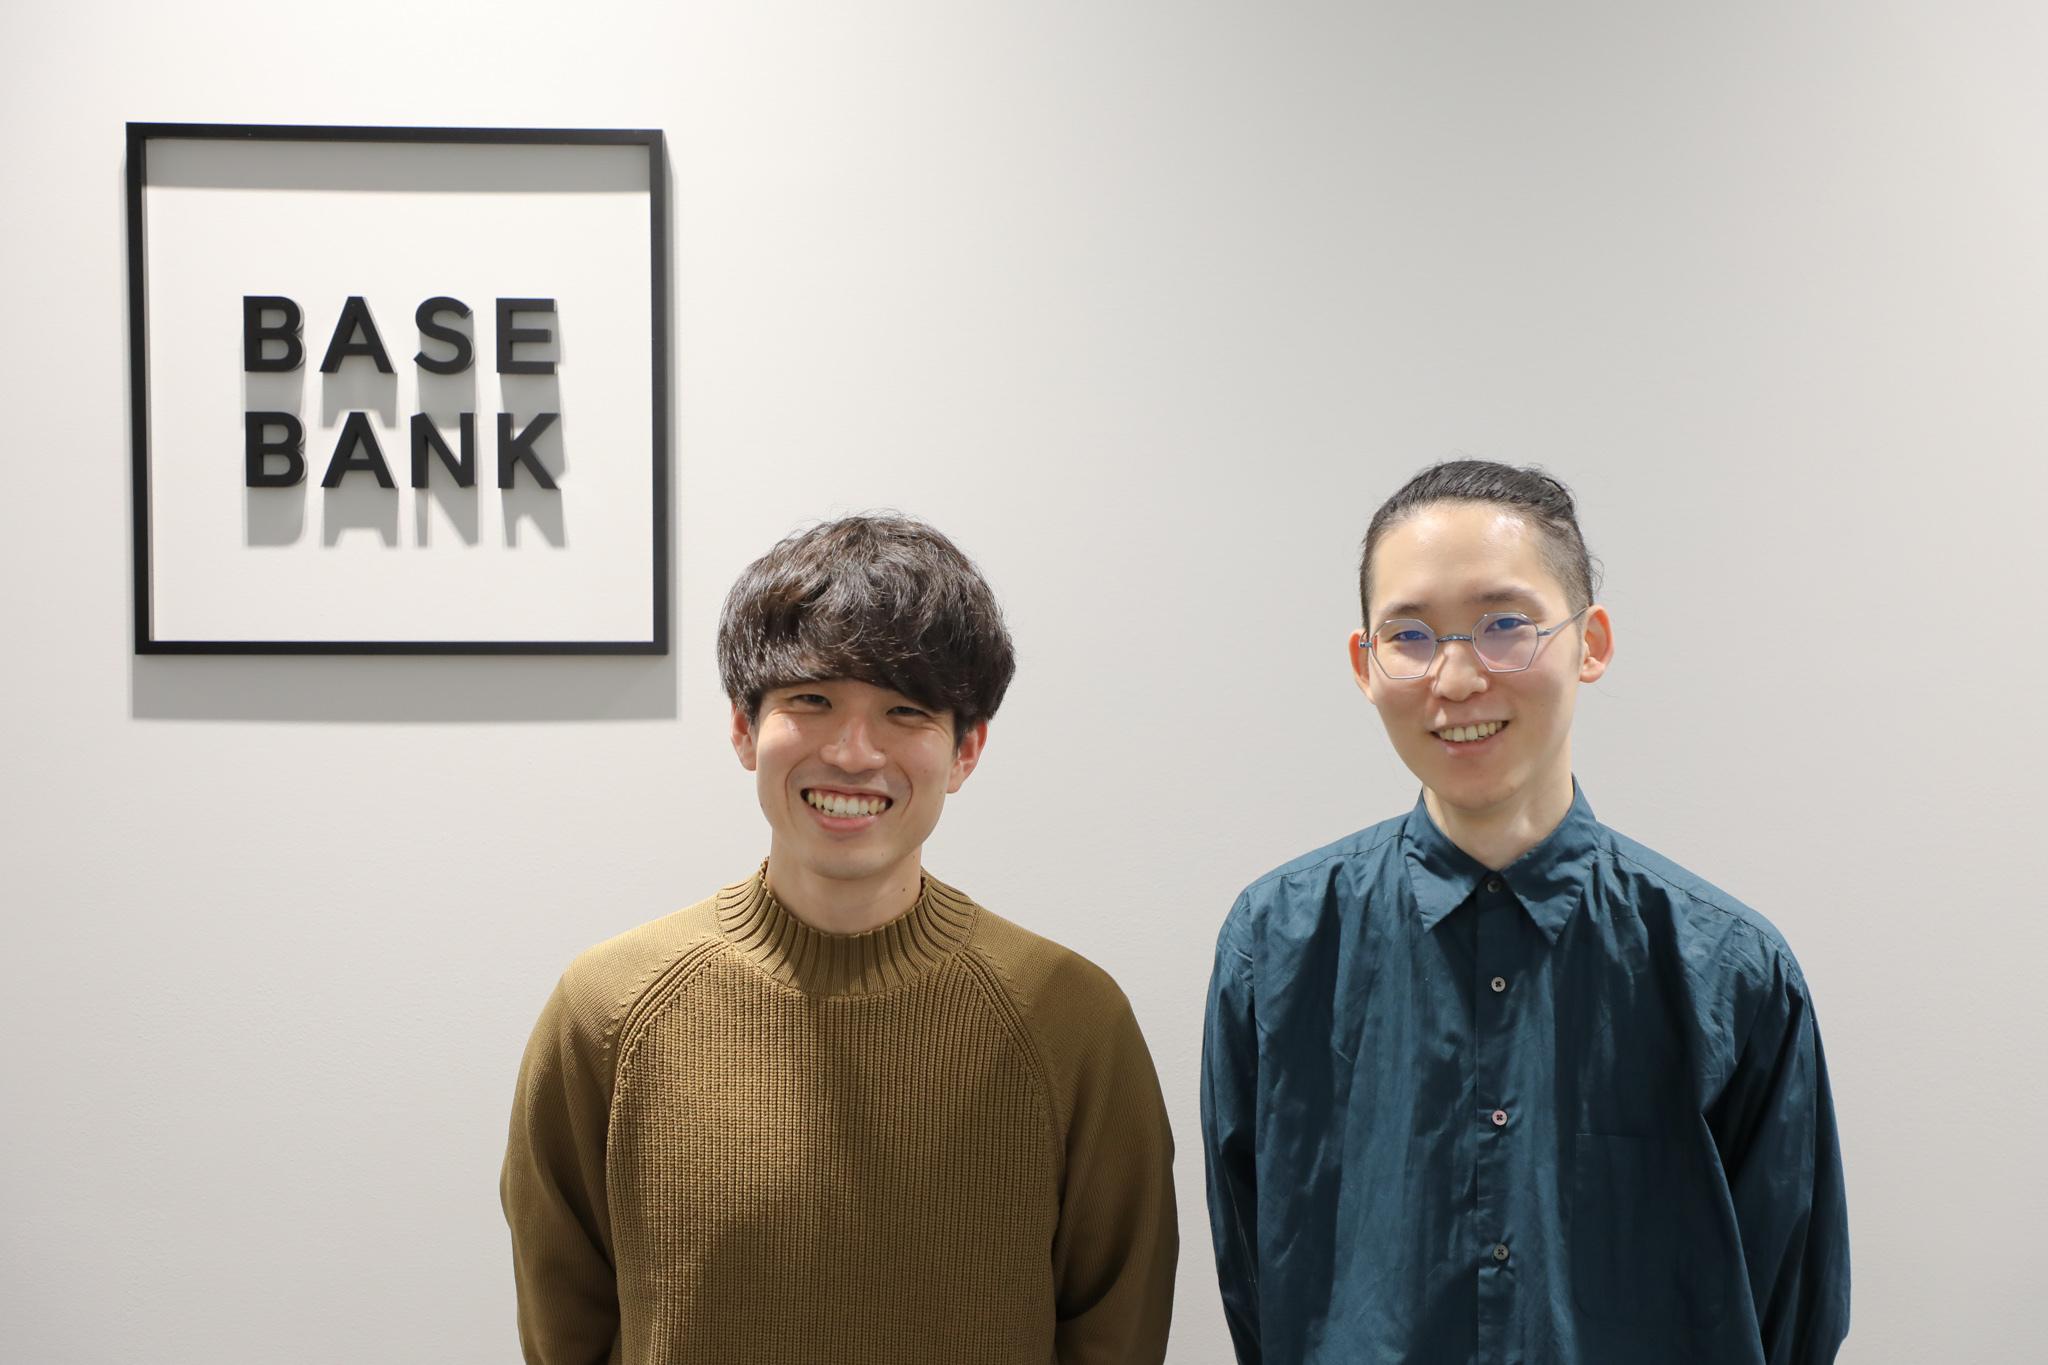 5.BASE BANK_カスタマーサクセス